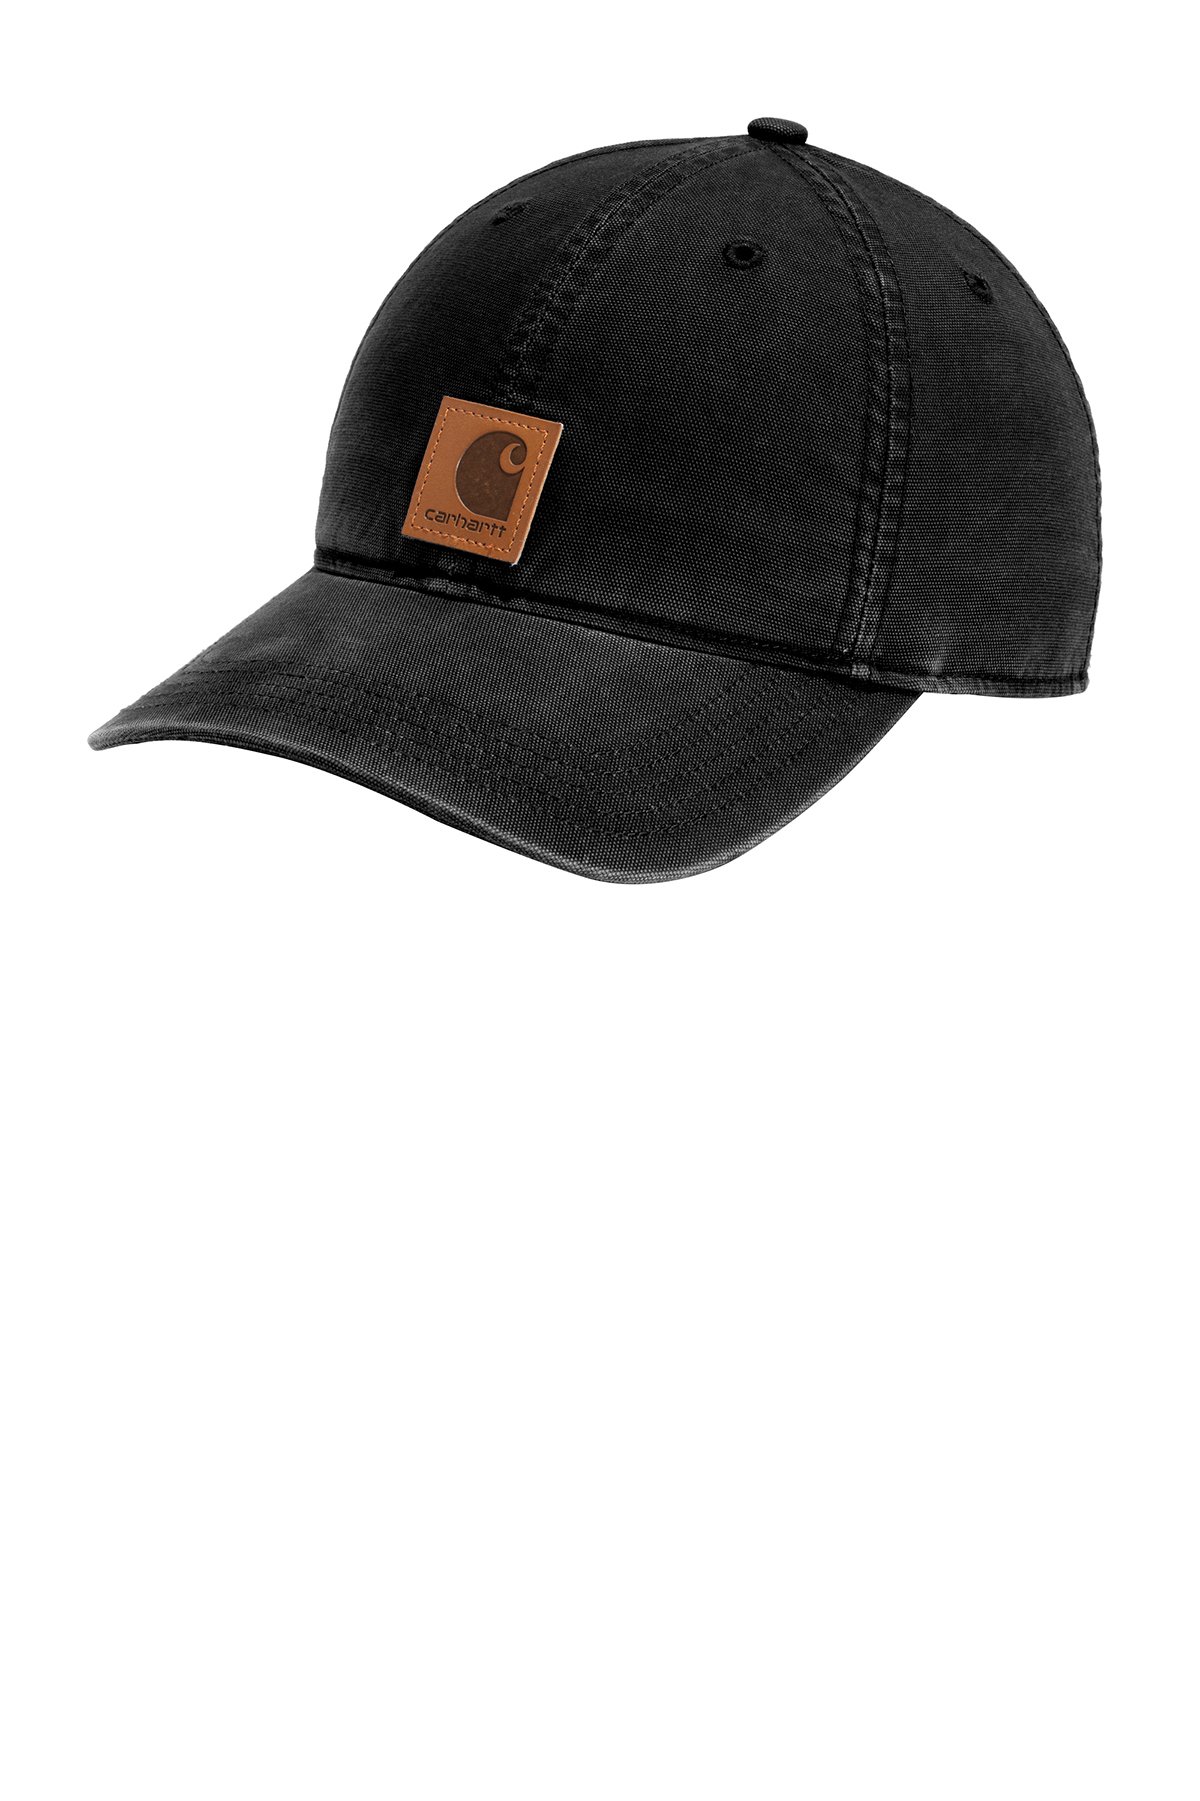 Carhartt® CT100289 - Odessa Cap  14.99 - Headwear df065102946e